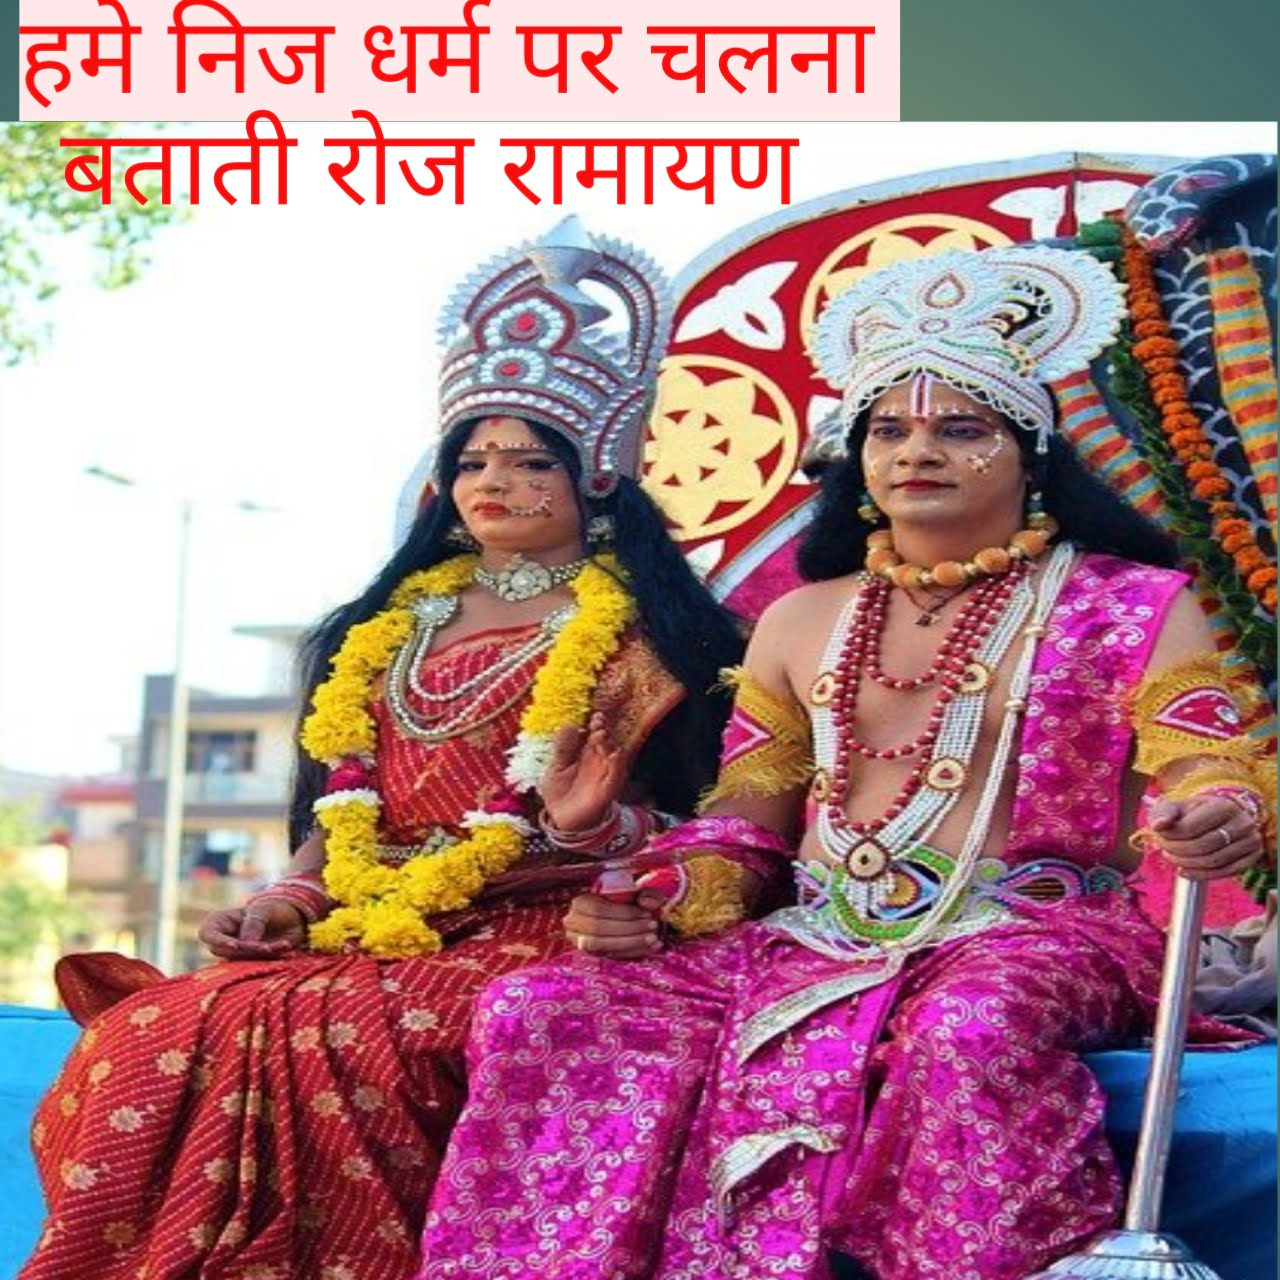 हमें निज धर्म पर चलना बताती रोज रामायण लिरिक्स, हिन्दी भजन